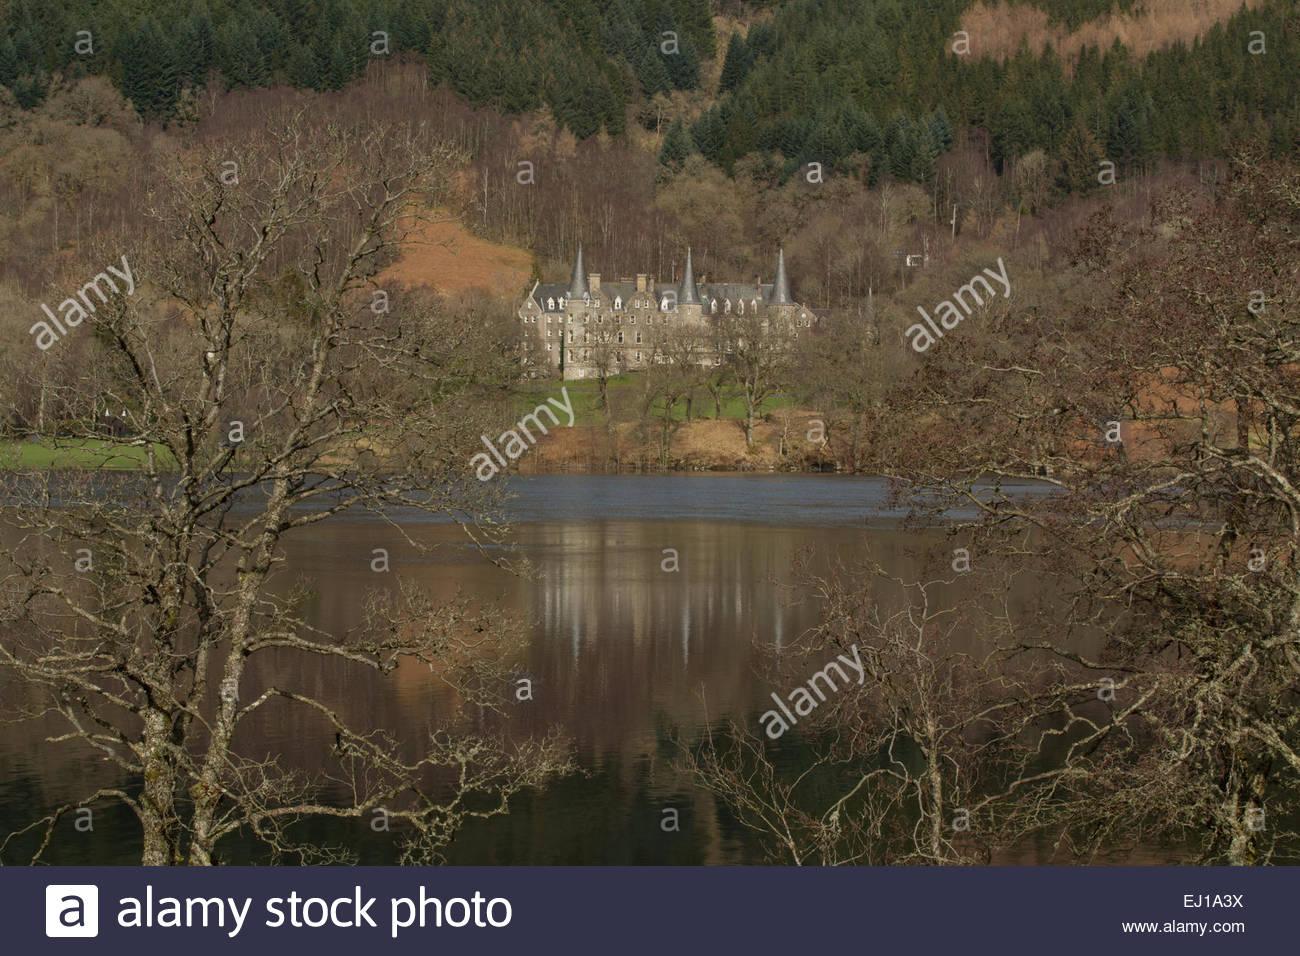 LOCH ACHRAY, LOCH LOMOND & THE TROSSACHS NATIONAL PARK, STIRLINGSHIRE, Schottland: Tigh Mor Trossachs Urlaub Stockbild